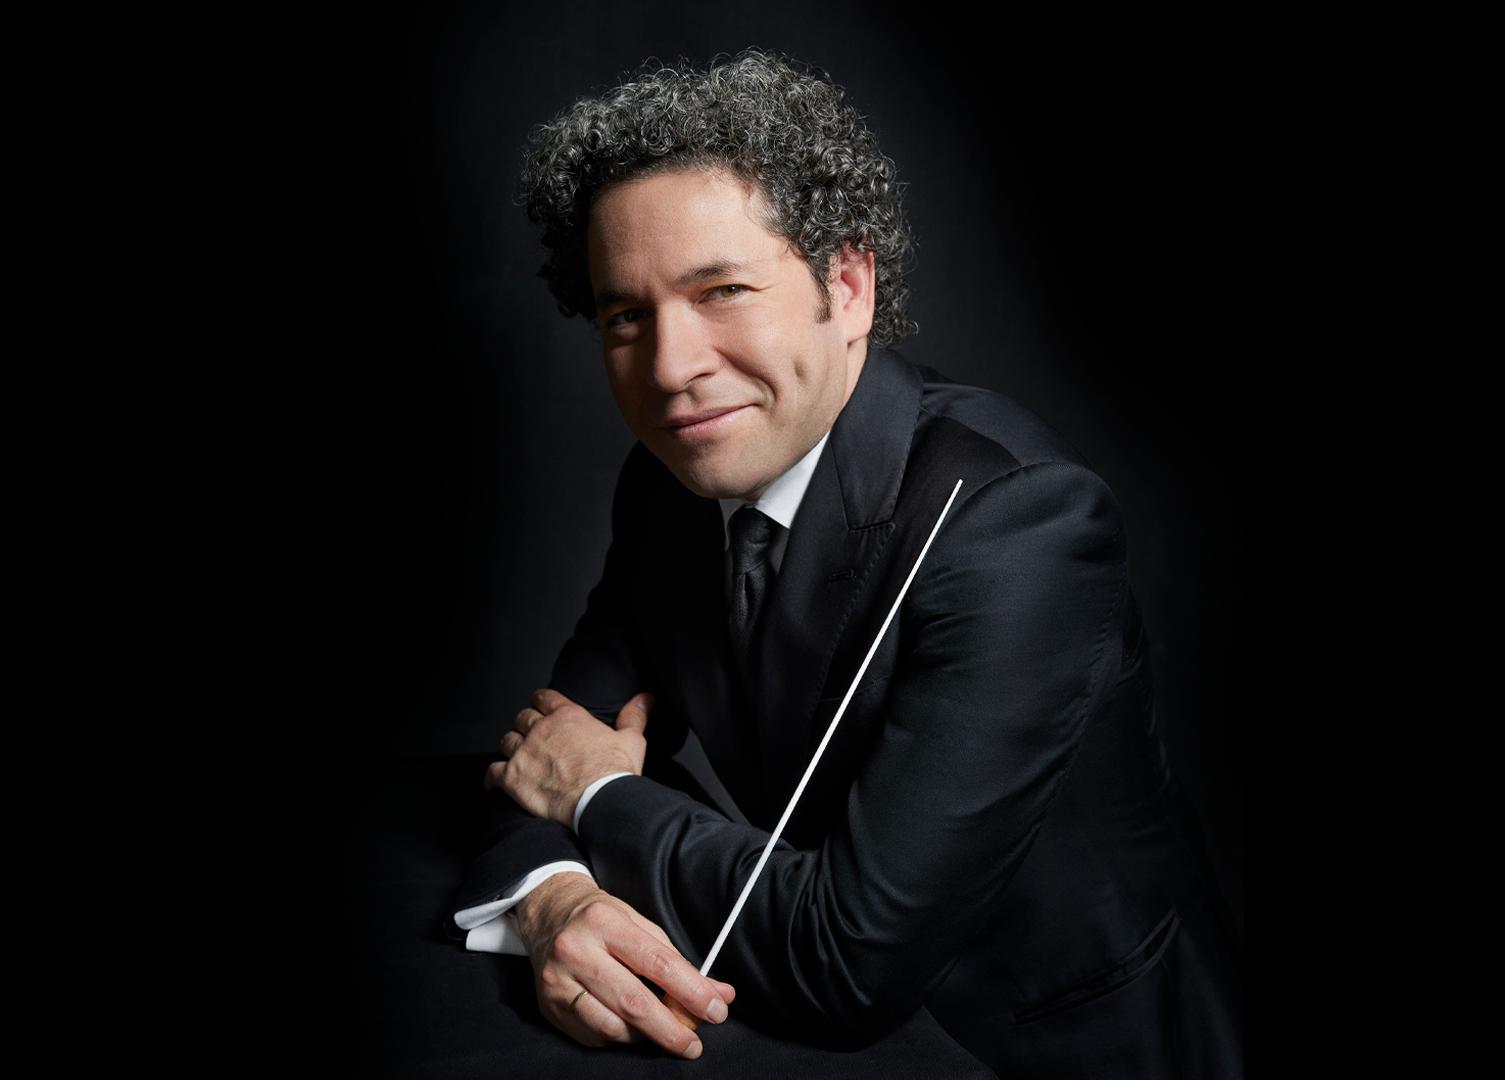 Music & Artistic Director Gustavo Dudamel